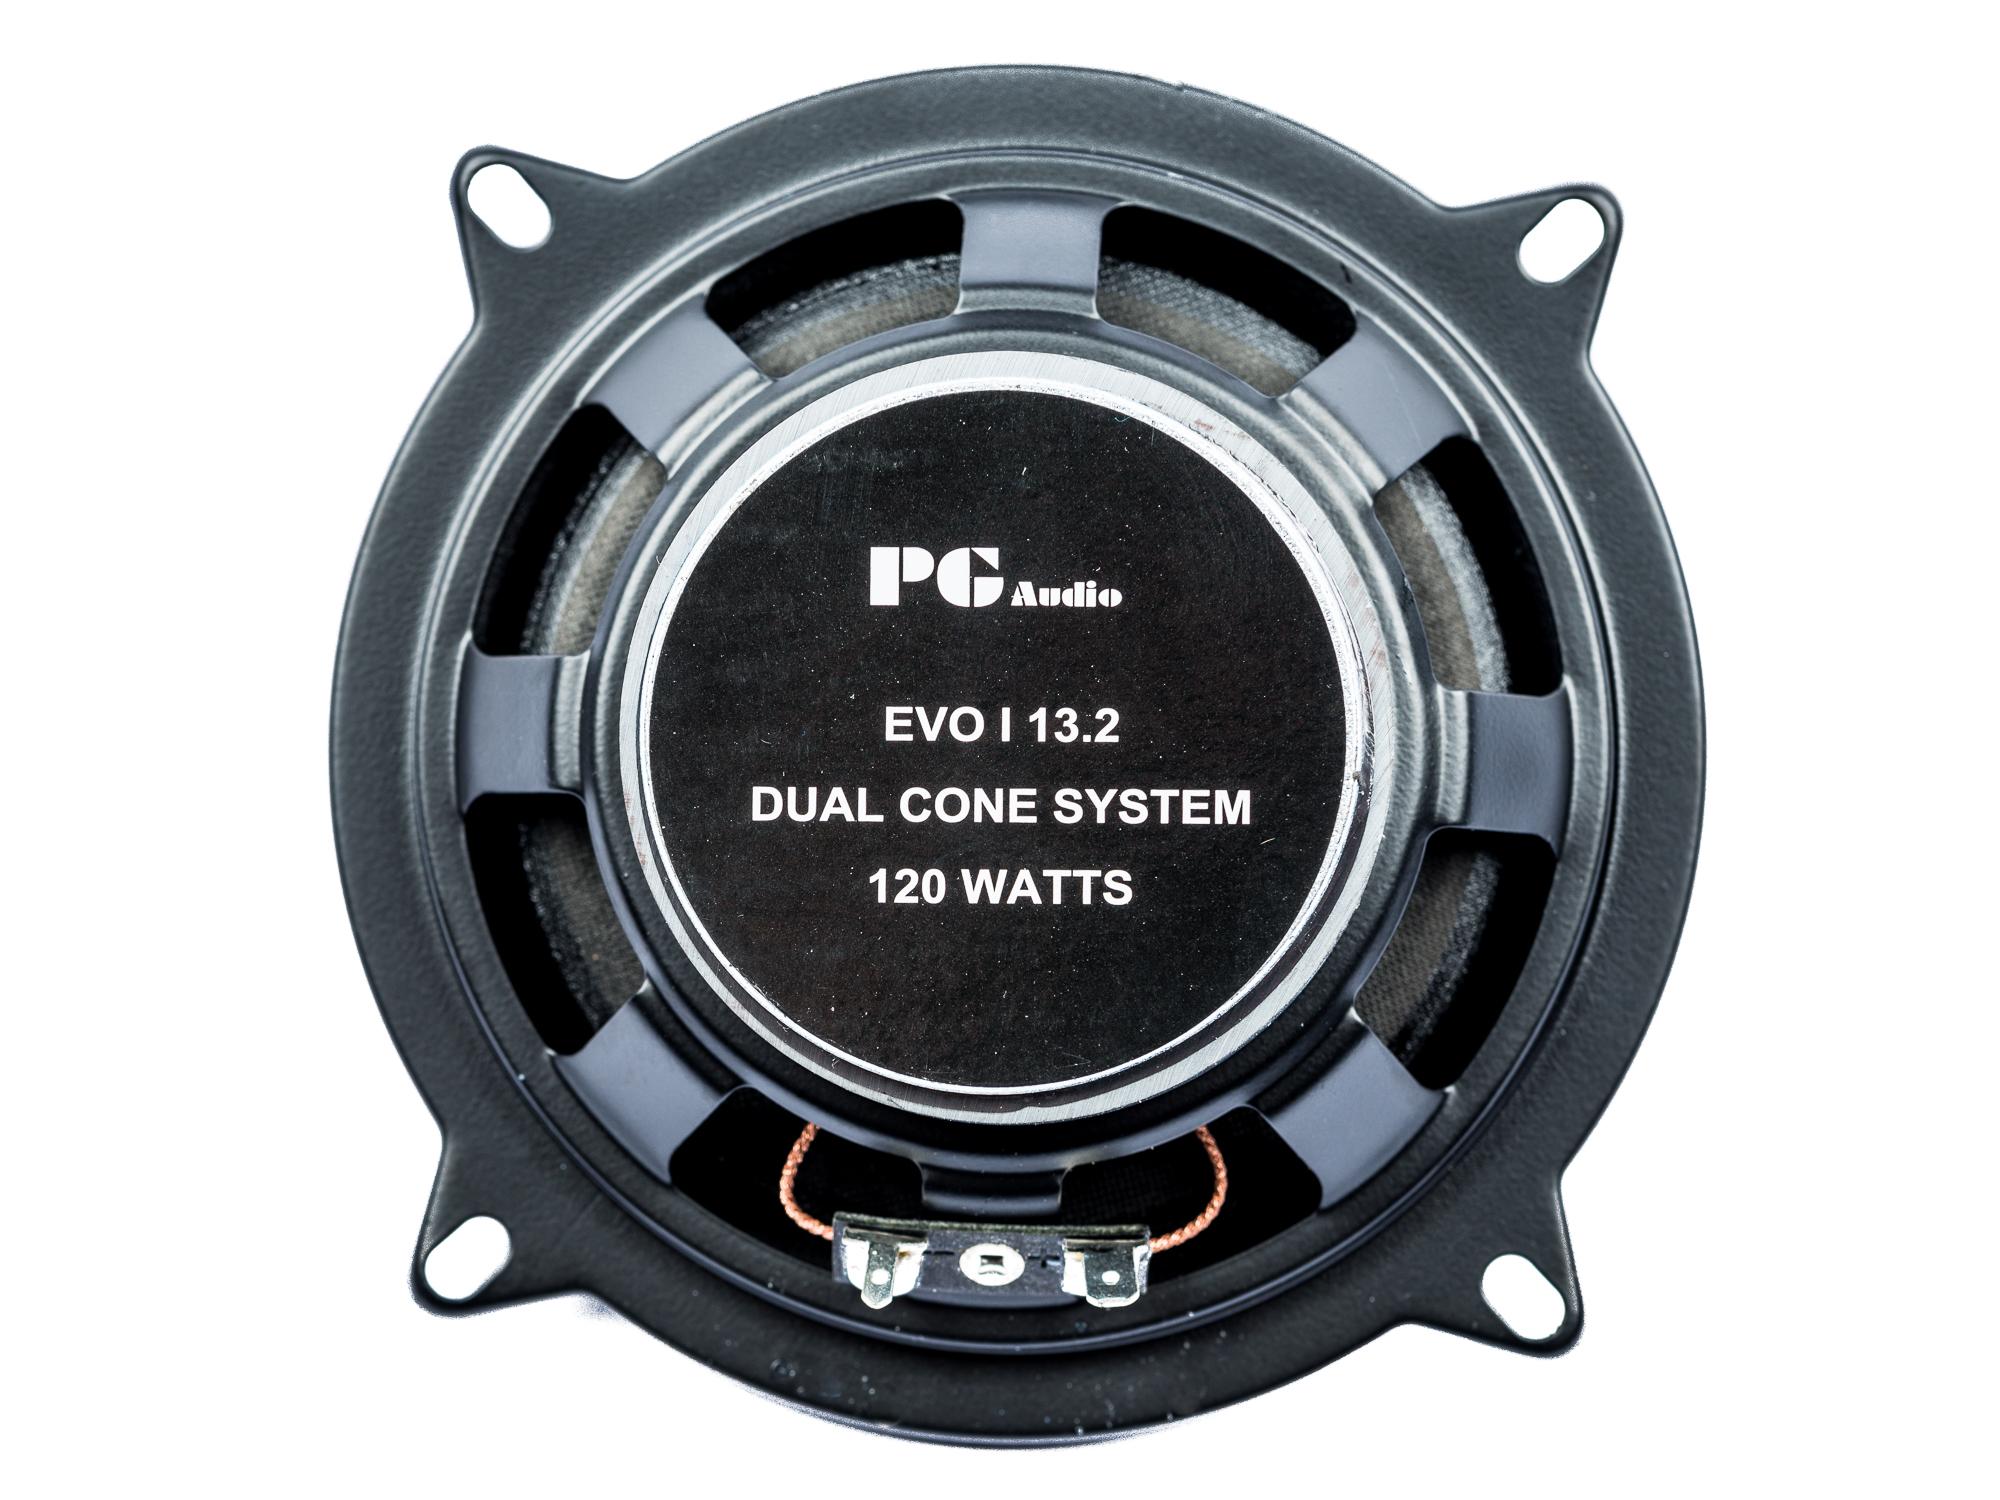 1 Paar PG Audio EVO I 13.2, 13 cm Dual Cone Lautsprecher , B-Ware – Bild 3